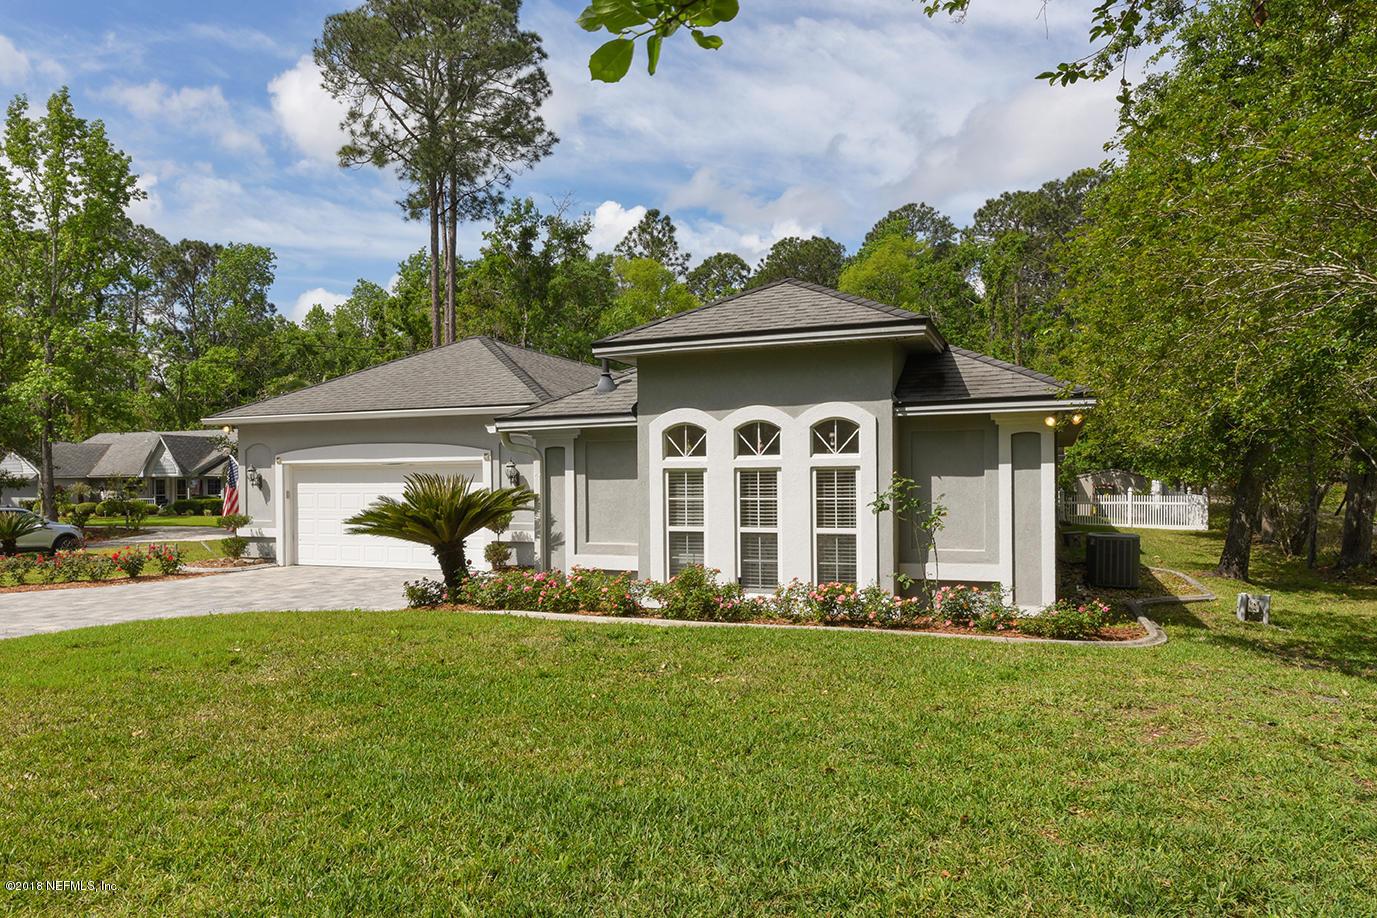 4915 HARVEY GRANT, FLEMING ISLAND, FLORIDA 32003, 5 Bedrooms Bedrooms, ,4 BathroomsBathrooms,Residential - single family,For sale,HARVEY GRANT,929310